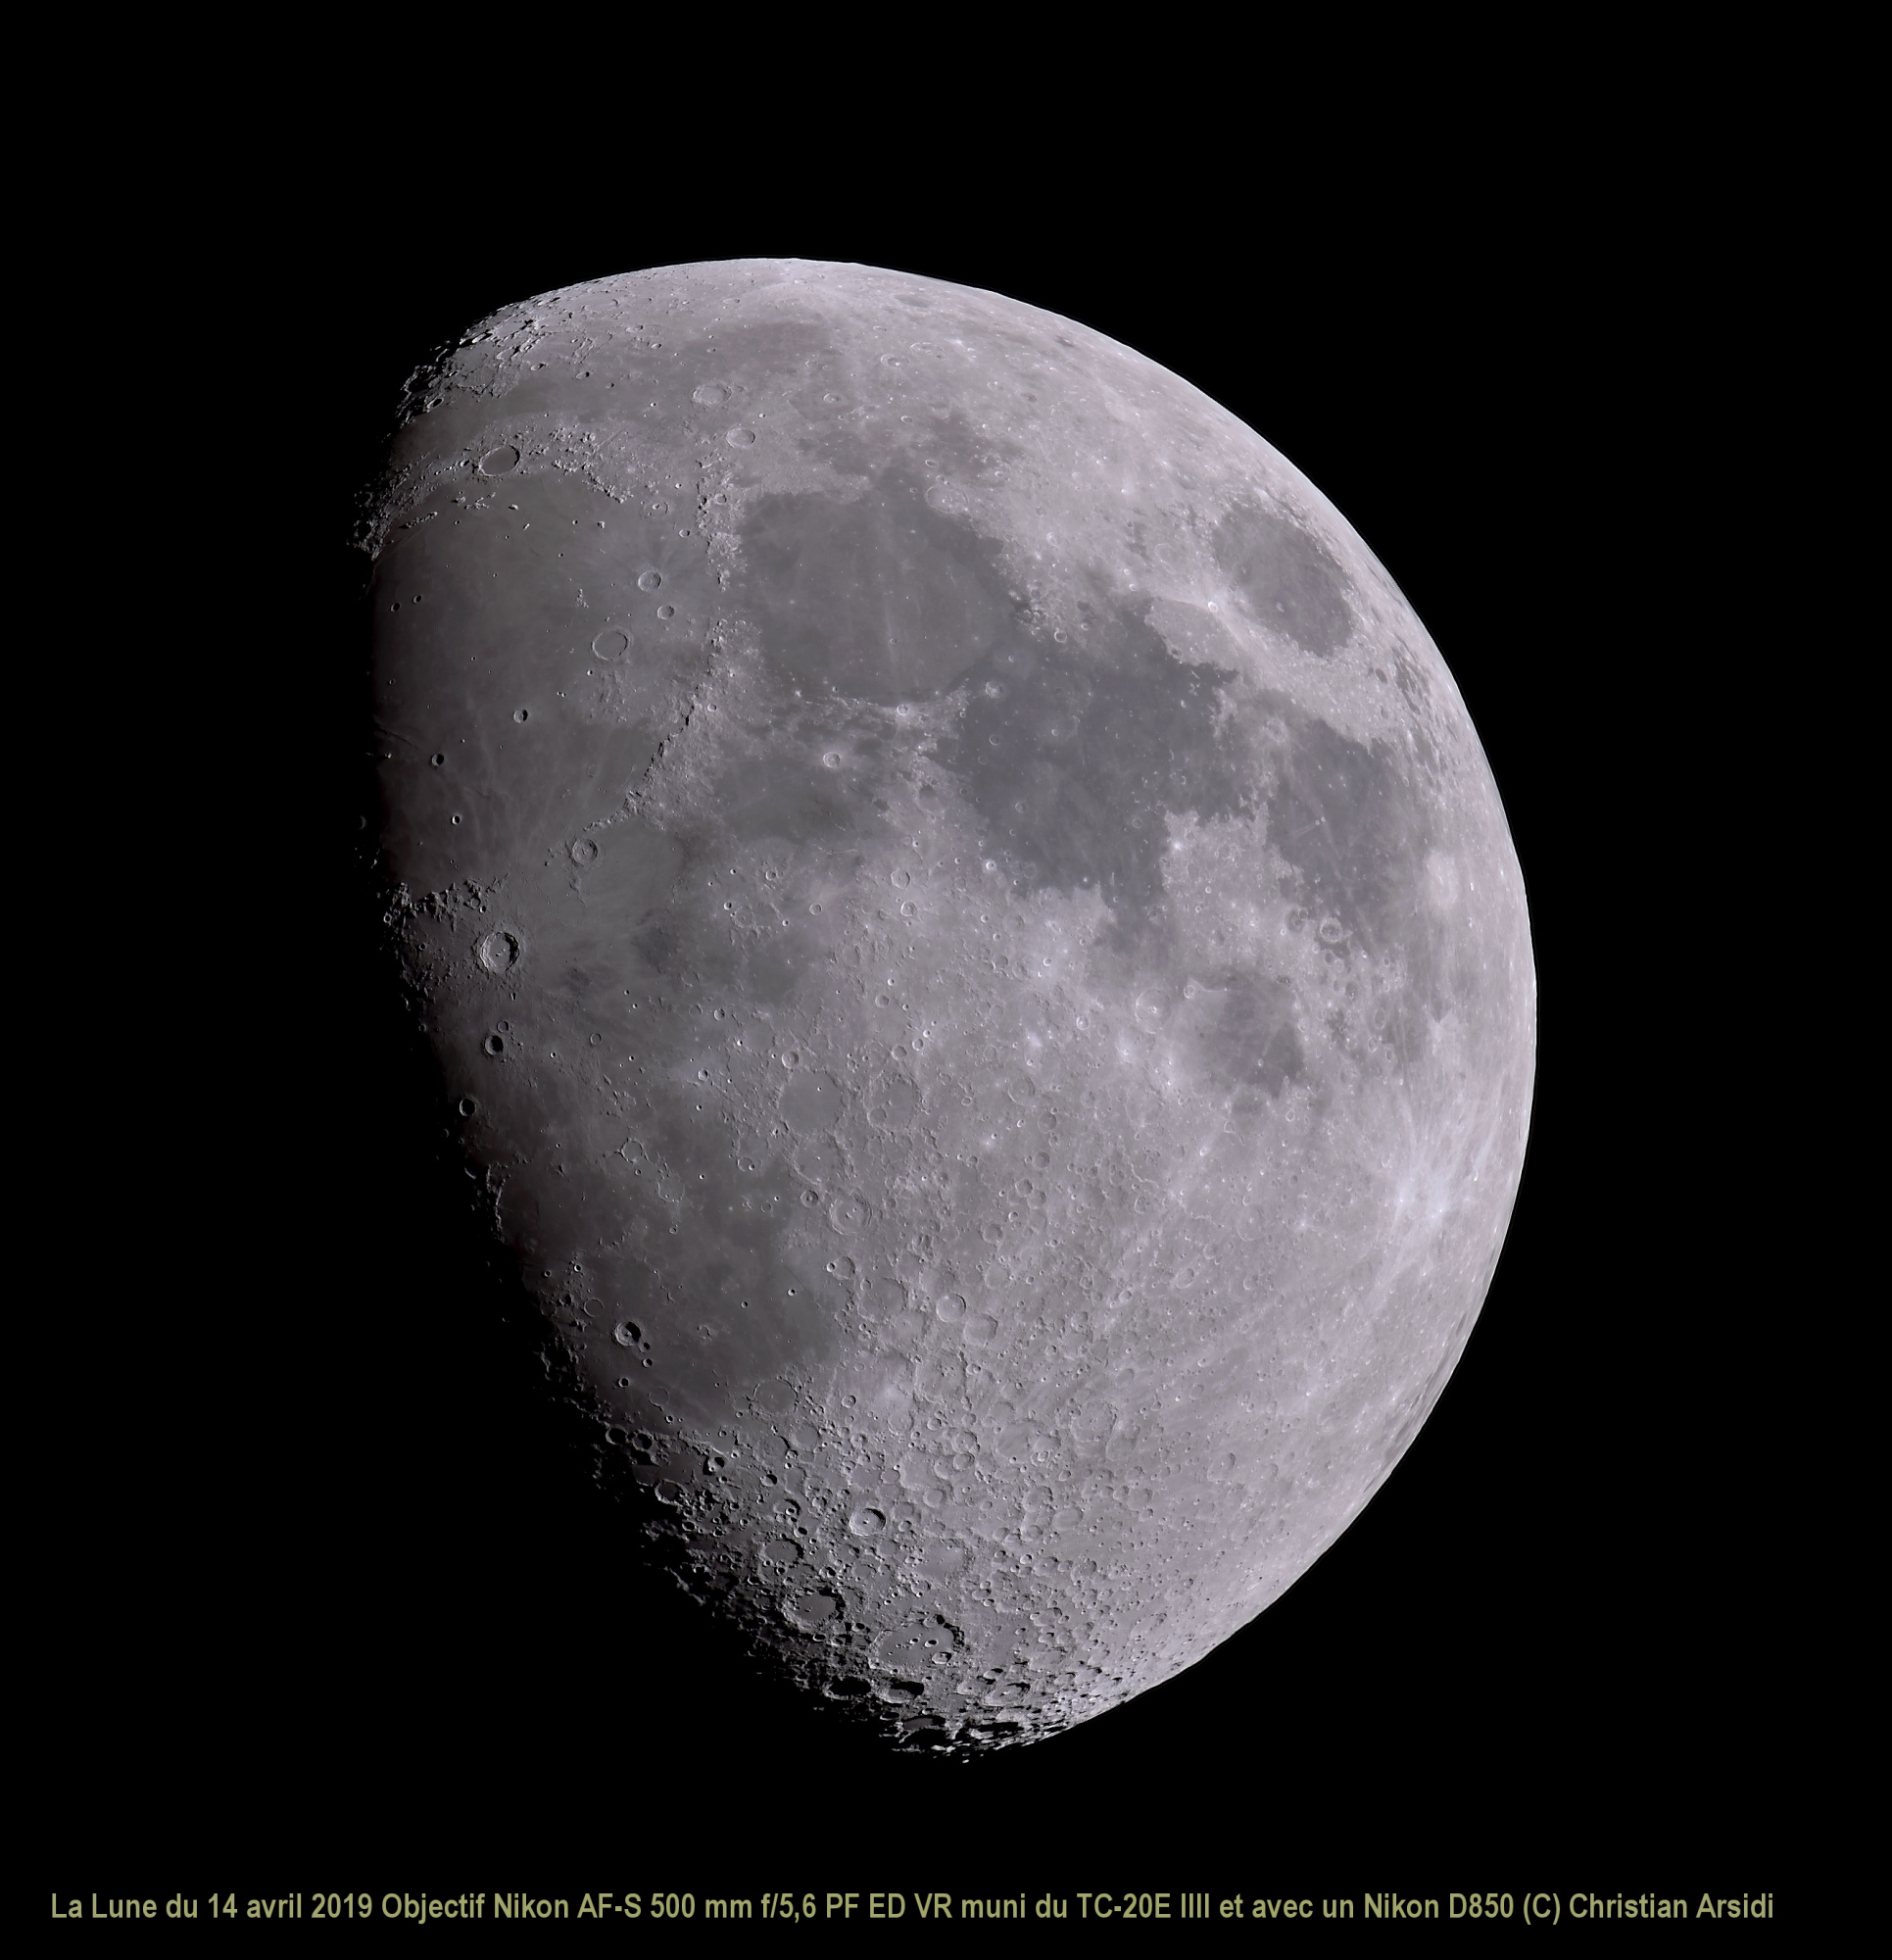 la Lune 40 images TTB 100% bonne image V2 JPEG.jpg